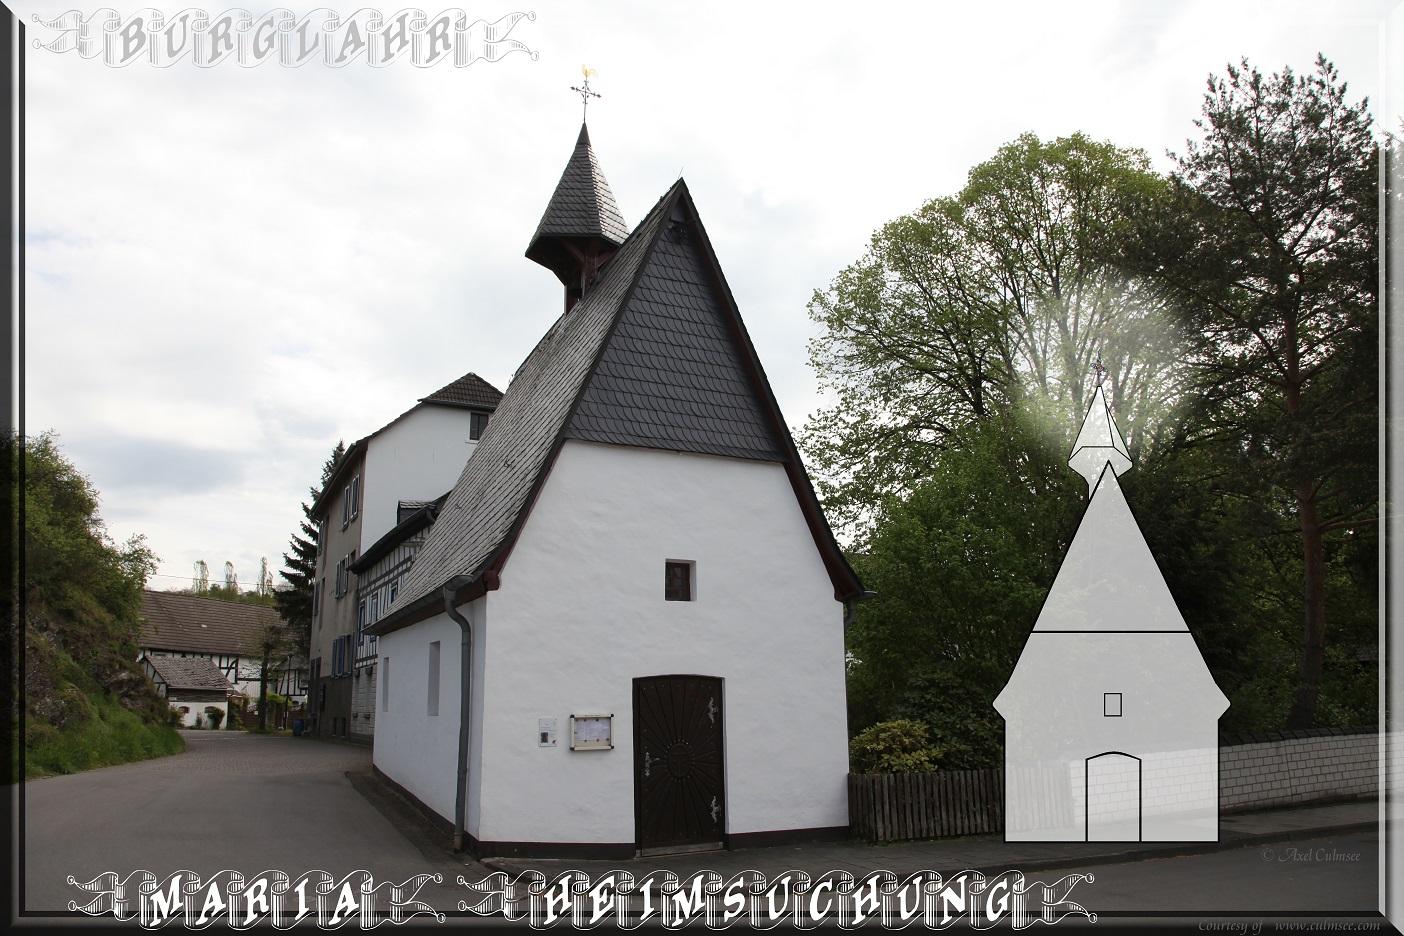 Burglahr Kapelle Maria Heimsuchung